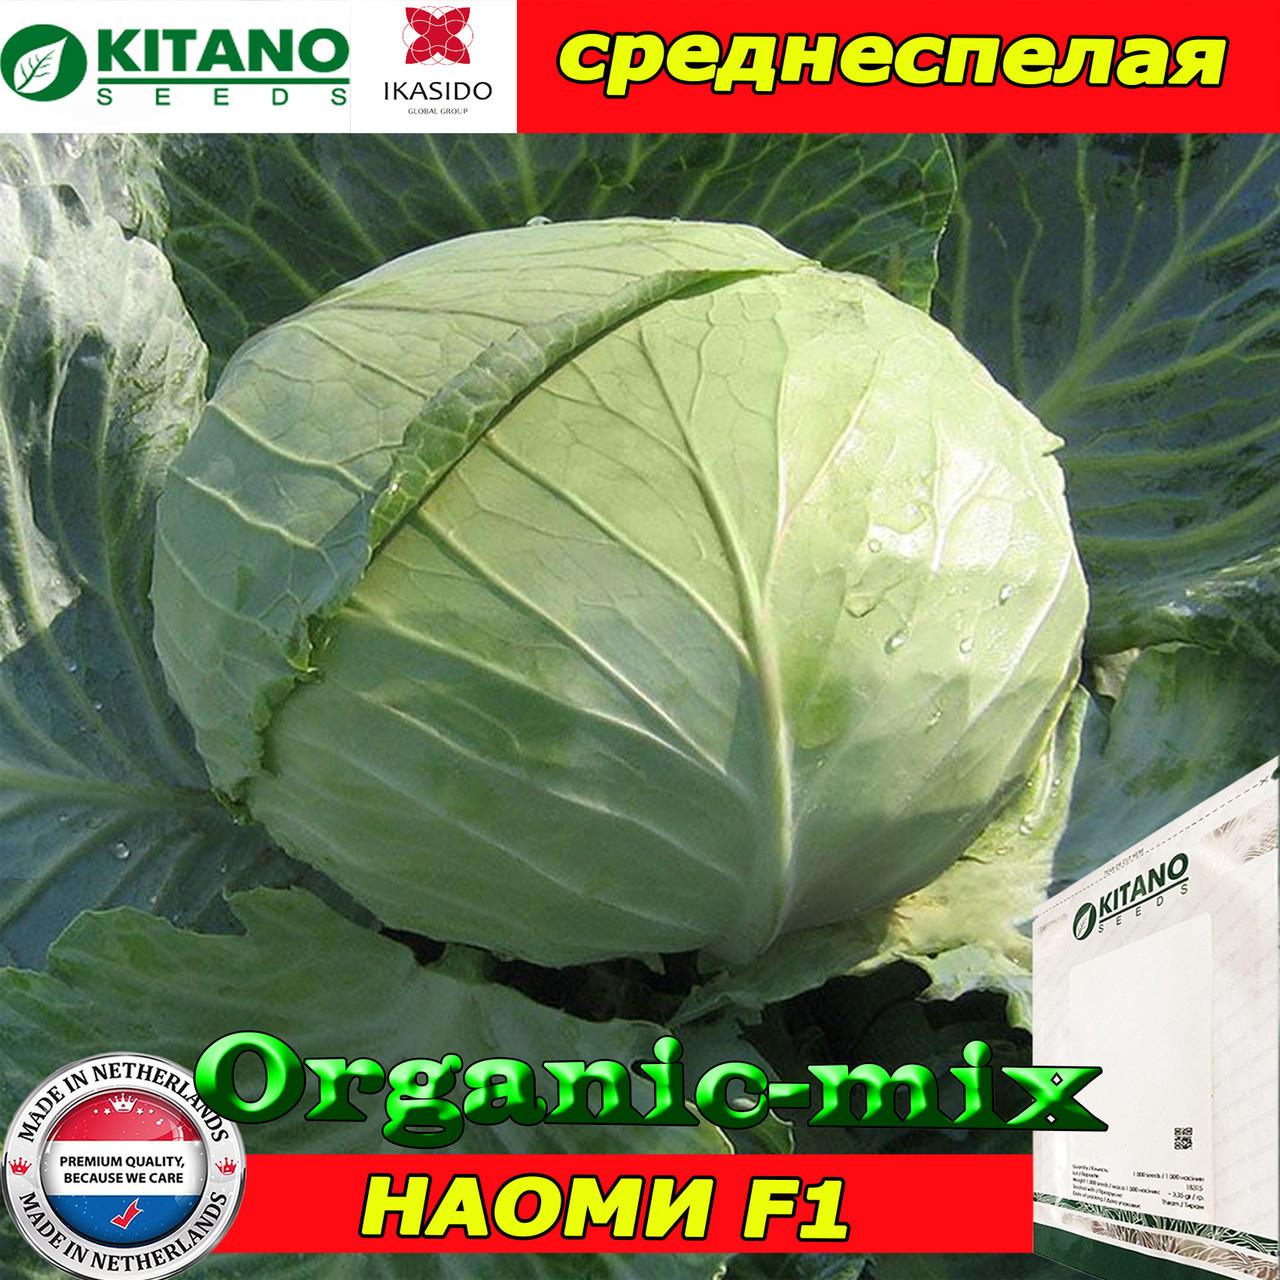 Капуста среднеспелая НАОМИ F1 (KITANO SEEDS, Нидерланды), проф.пакет 1000 семян